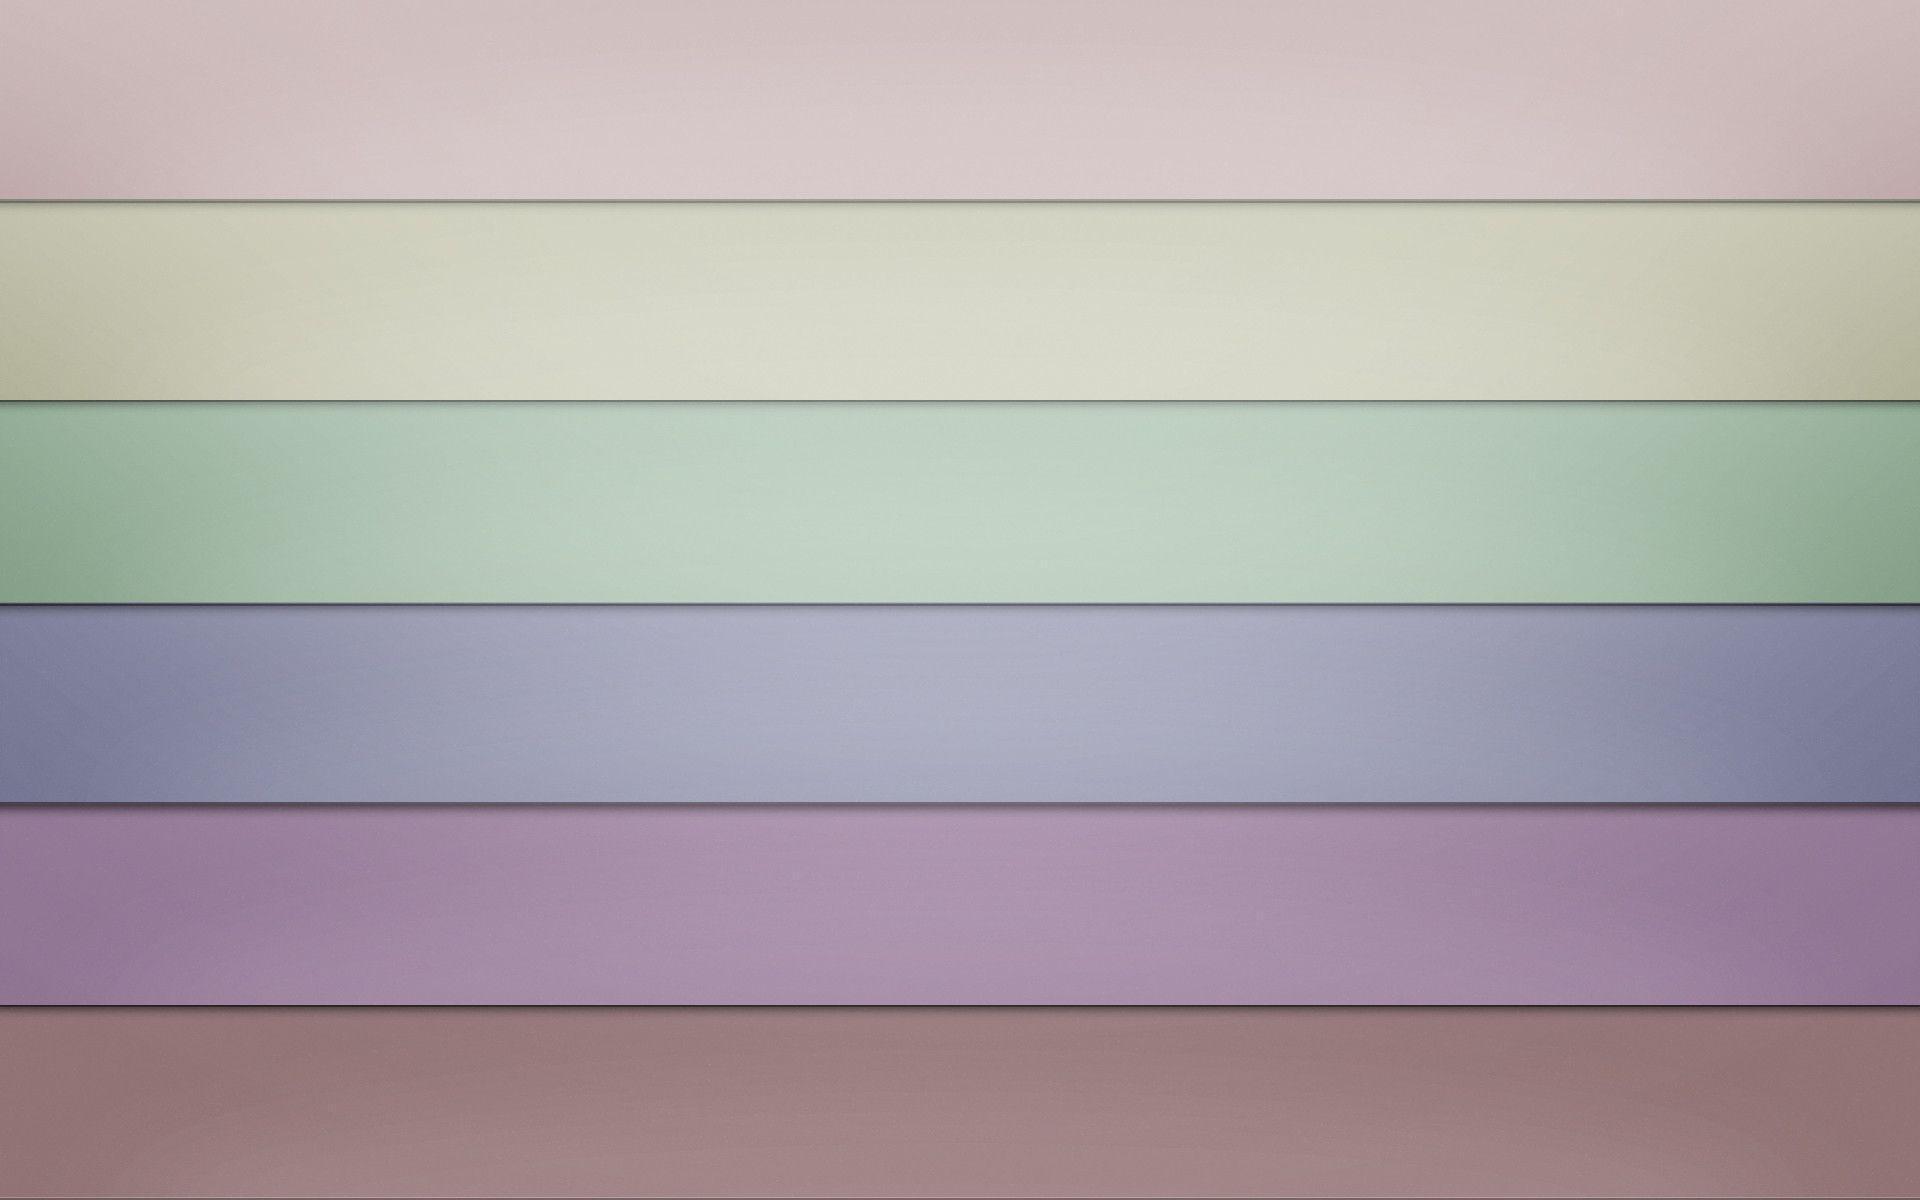 Download 660 Wallpaper Hd Pastel HD Terbaru